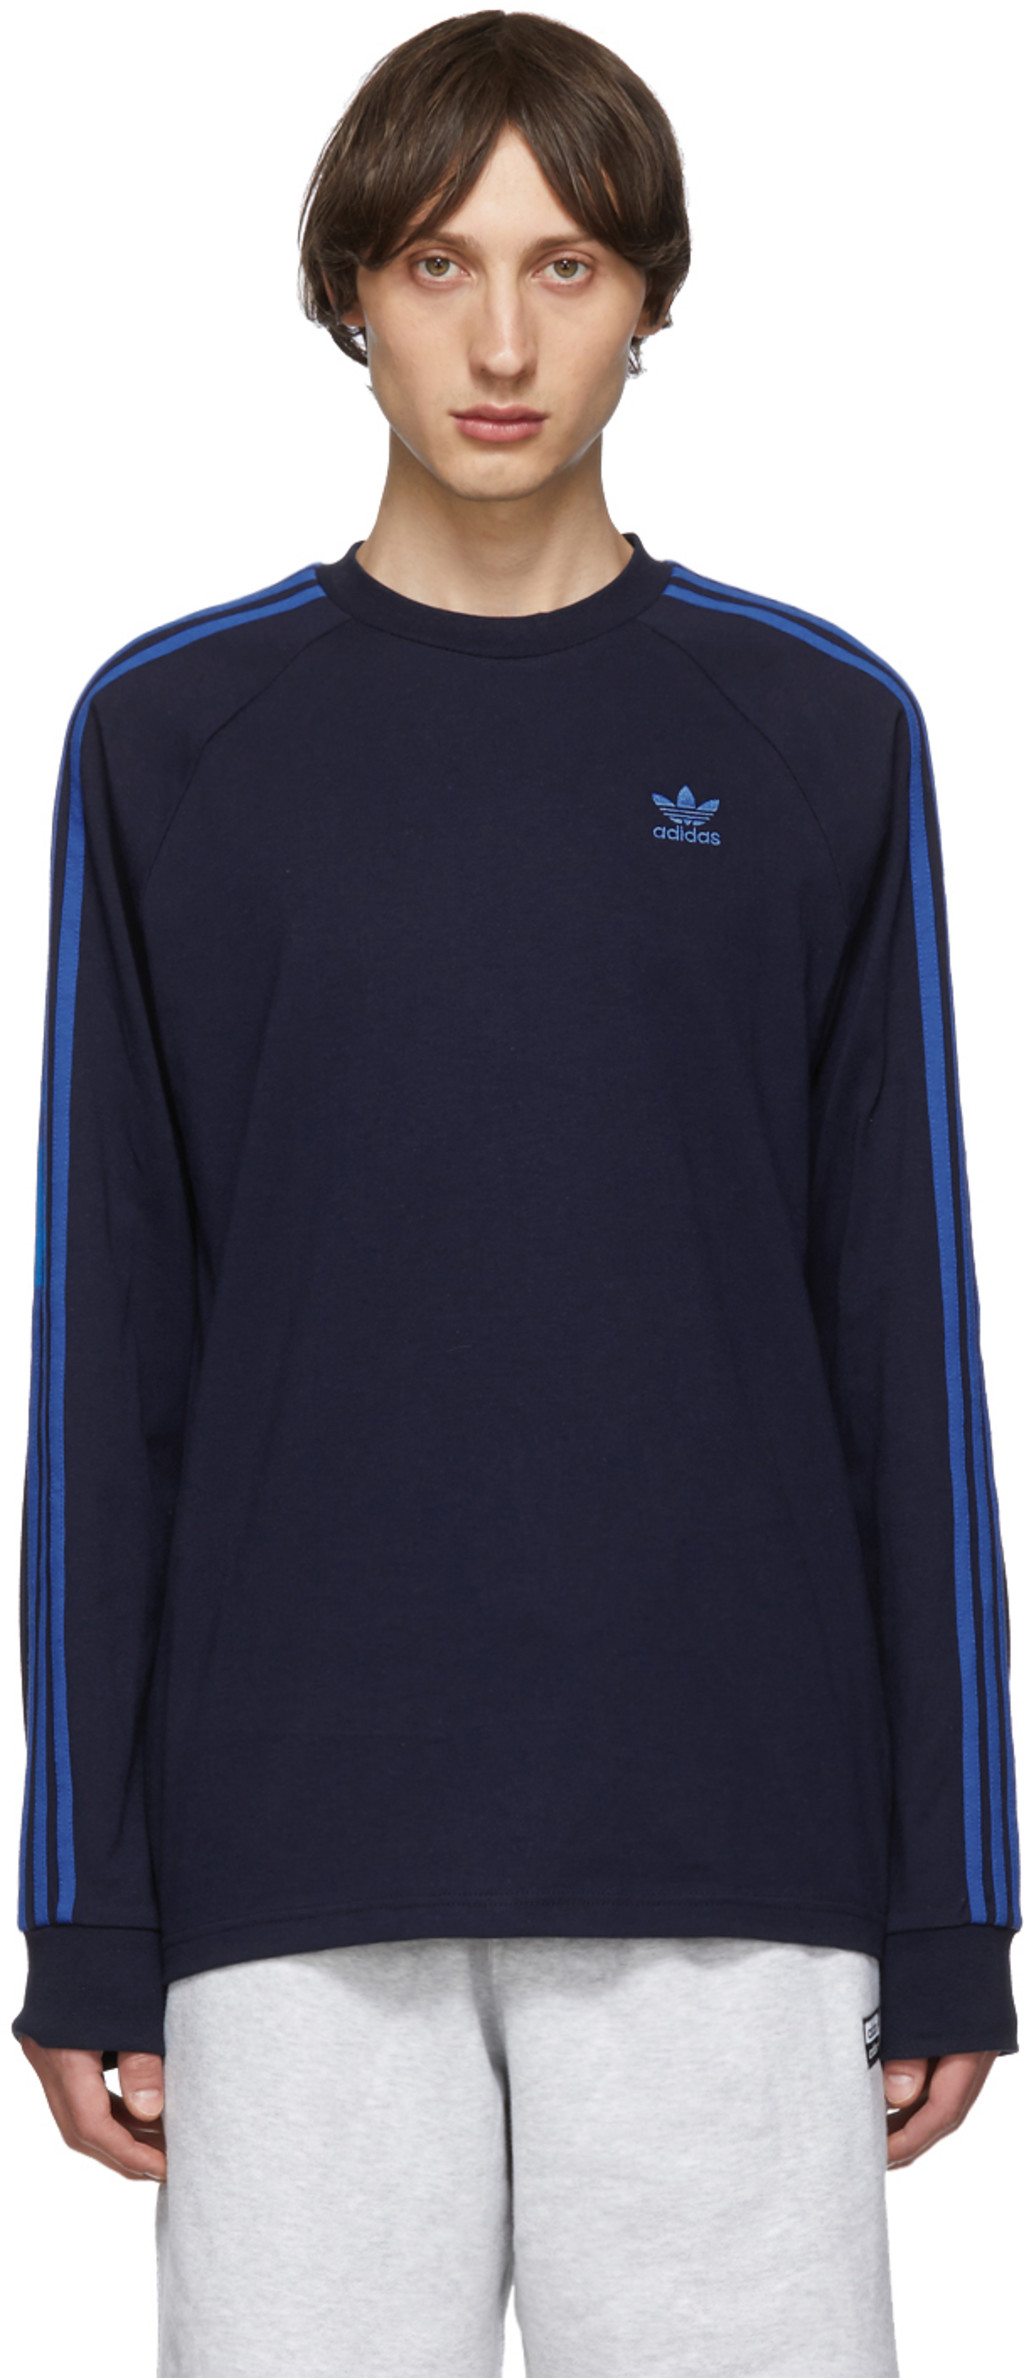 980bff9d72c Adidas Originals for Men SS19 Collection | SSENSE Canada